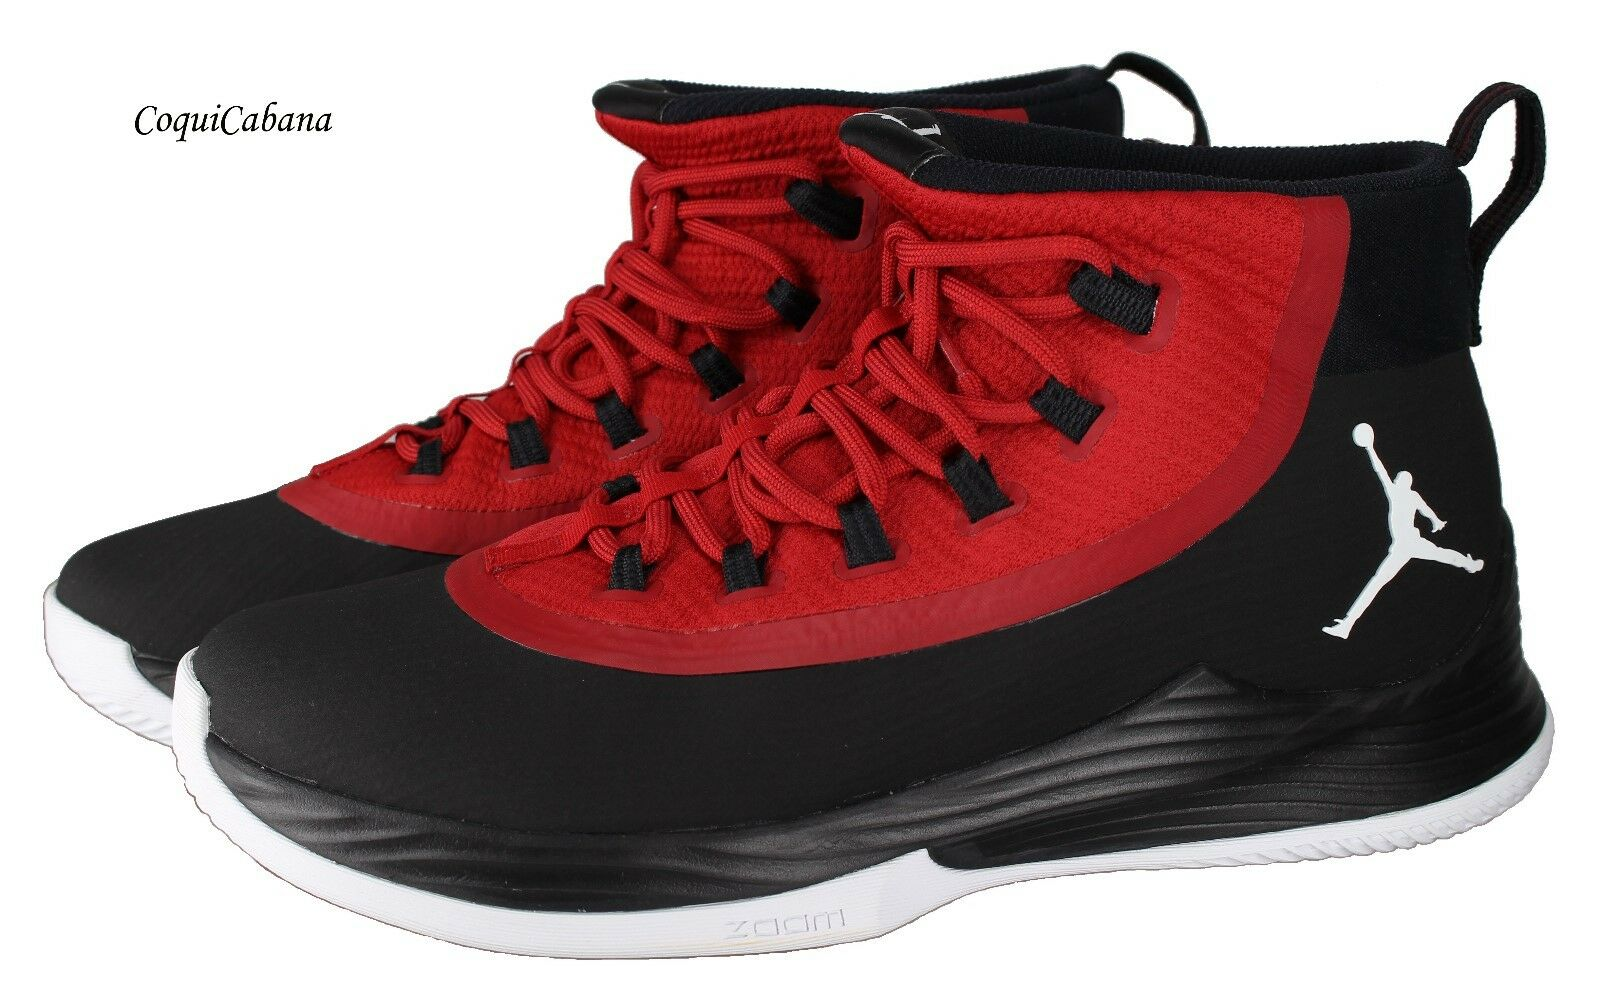 Nike Men's  Jordan Ultra Fly 2    Black - Red Basketball shoes Size 11.5 New